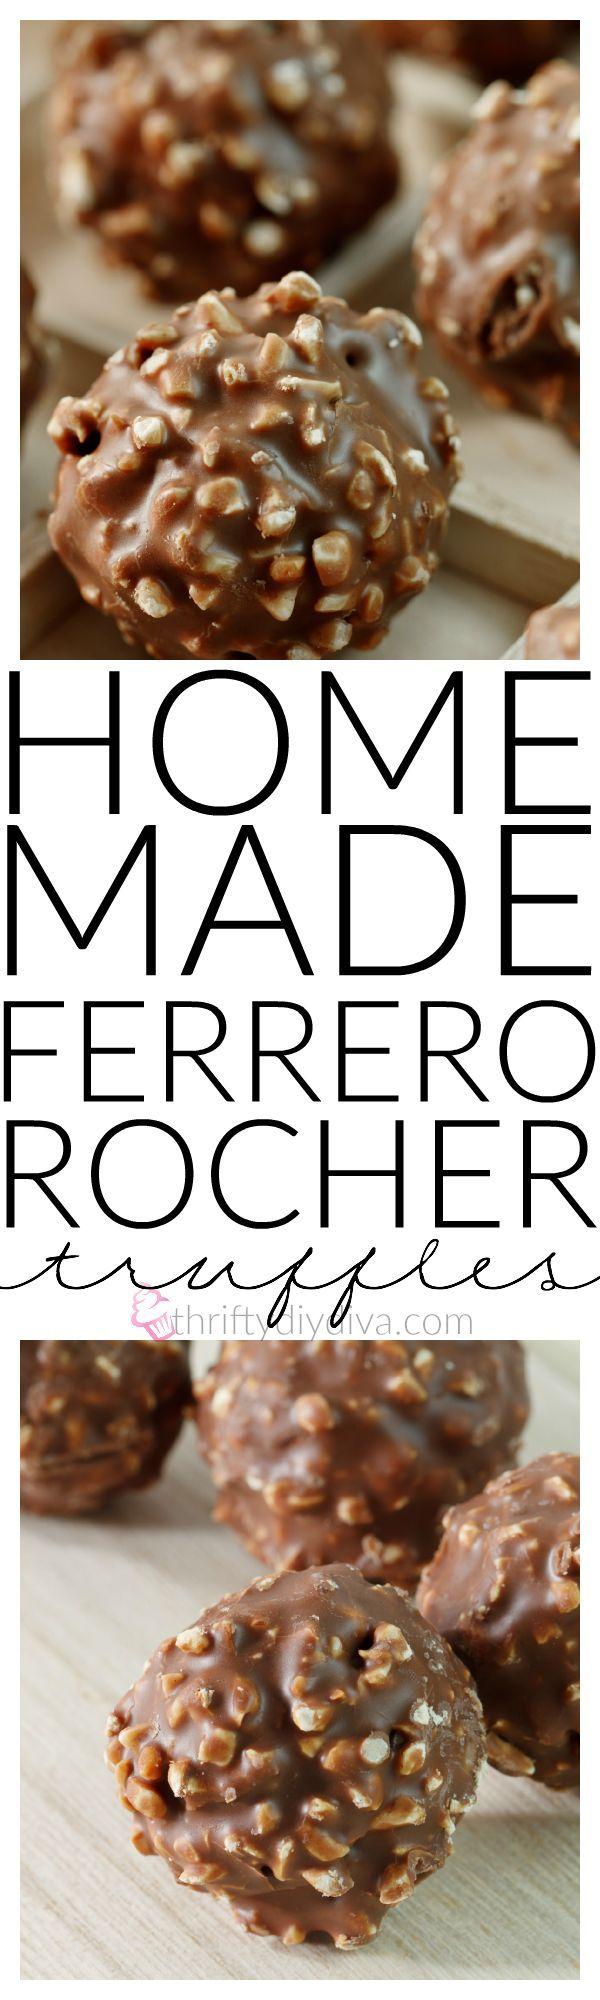 Homemade Ferrero Rocher Hazelnut Truffles | Recipe | Homemade ...